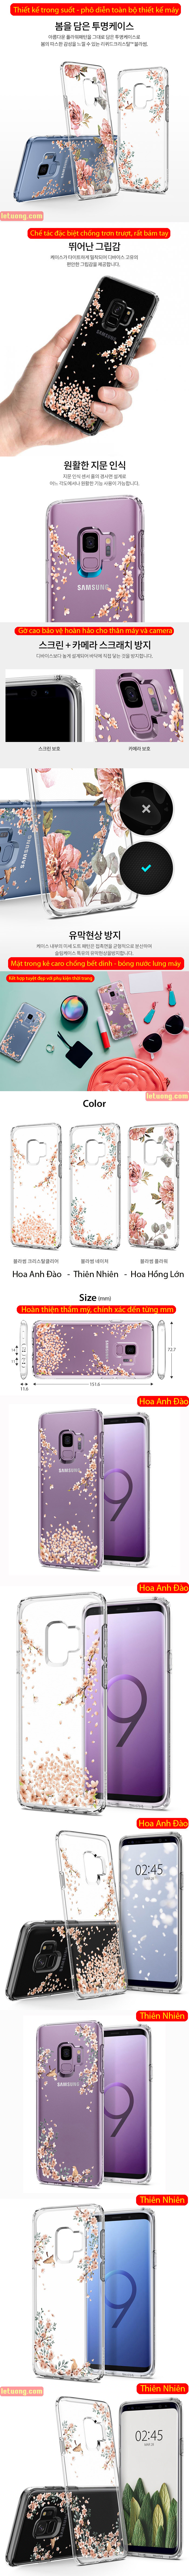 Ốp lưng Galaxy S9 Spigen Liquid Crystal Blossom thời trang từ USA 3